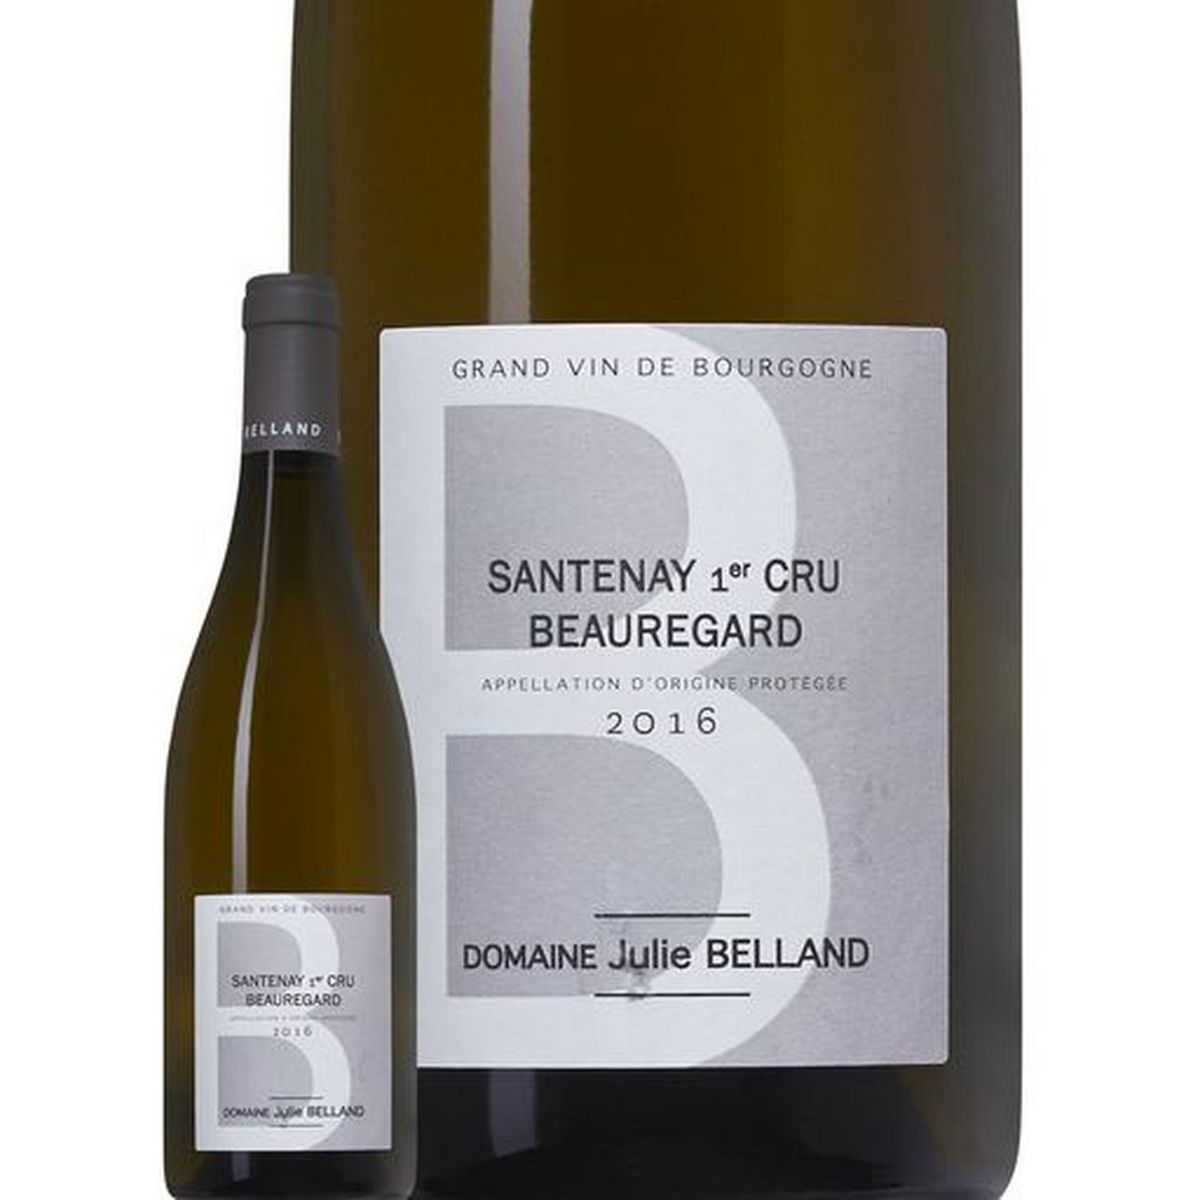 AOP Santenay Premier Cru Domaine Julie Belland Beauregard blanc 2016